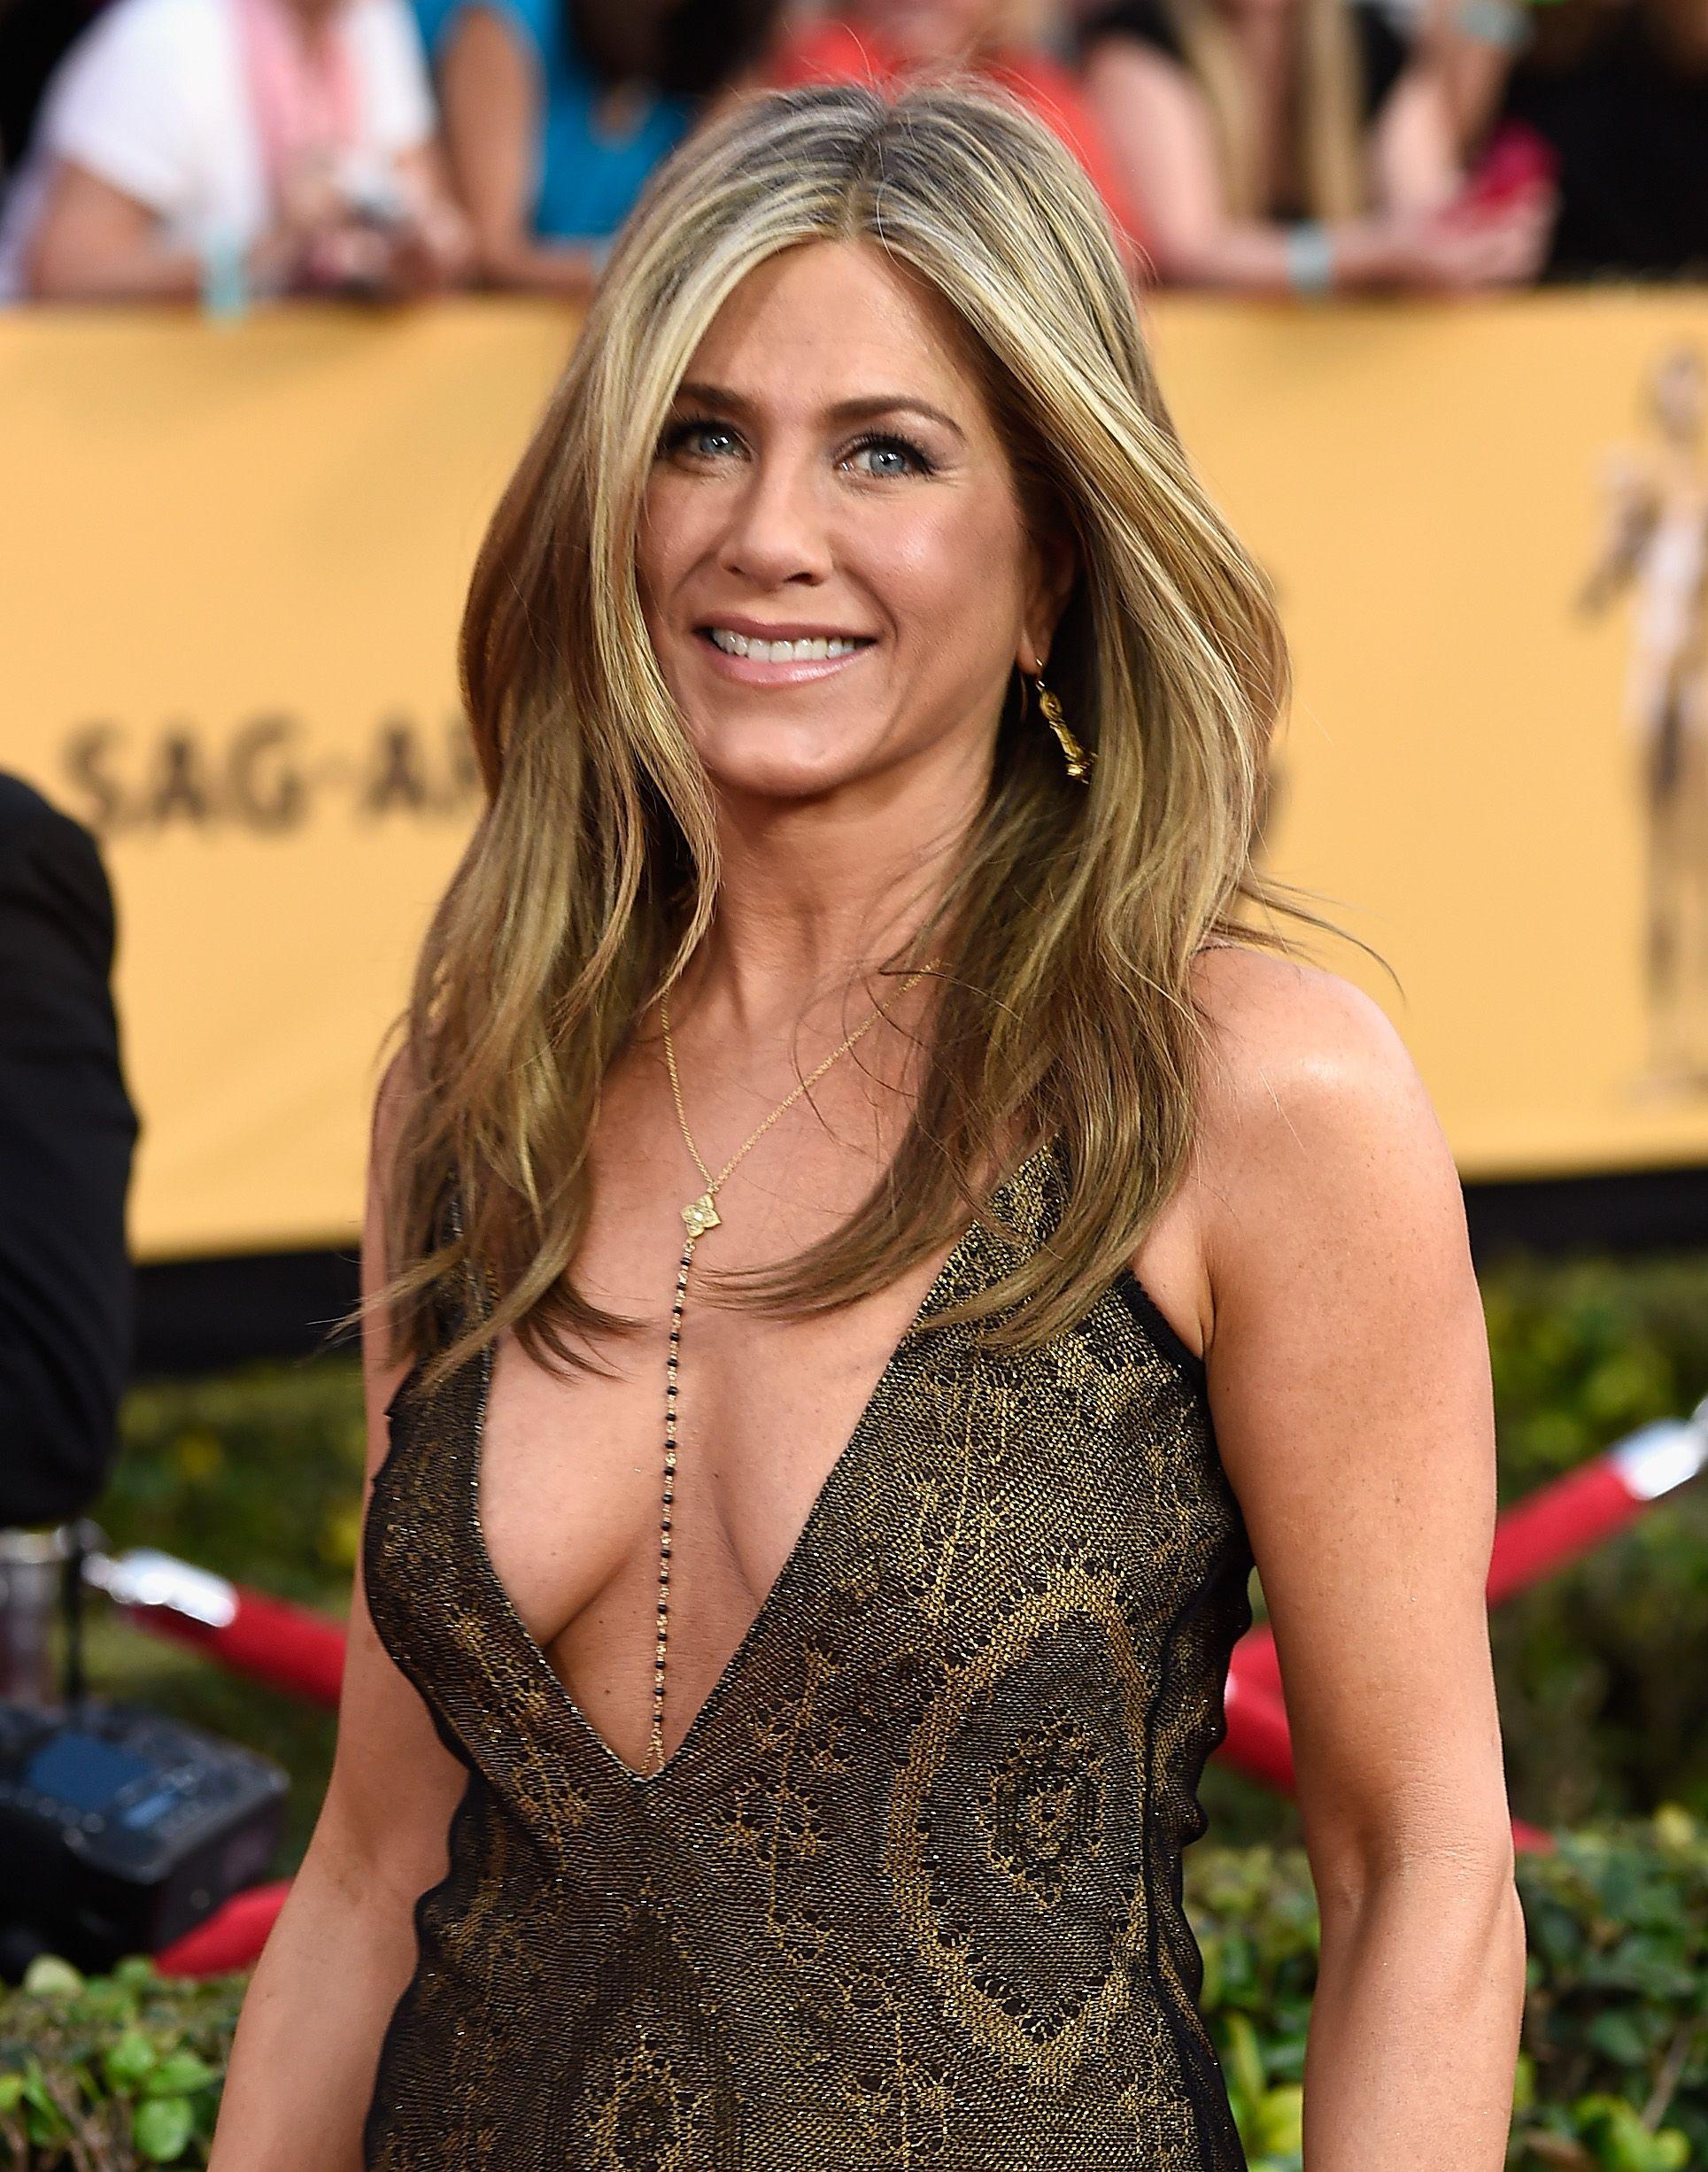 Jennifer Aniston reveals all the odd jobs she had before Friends